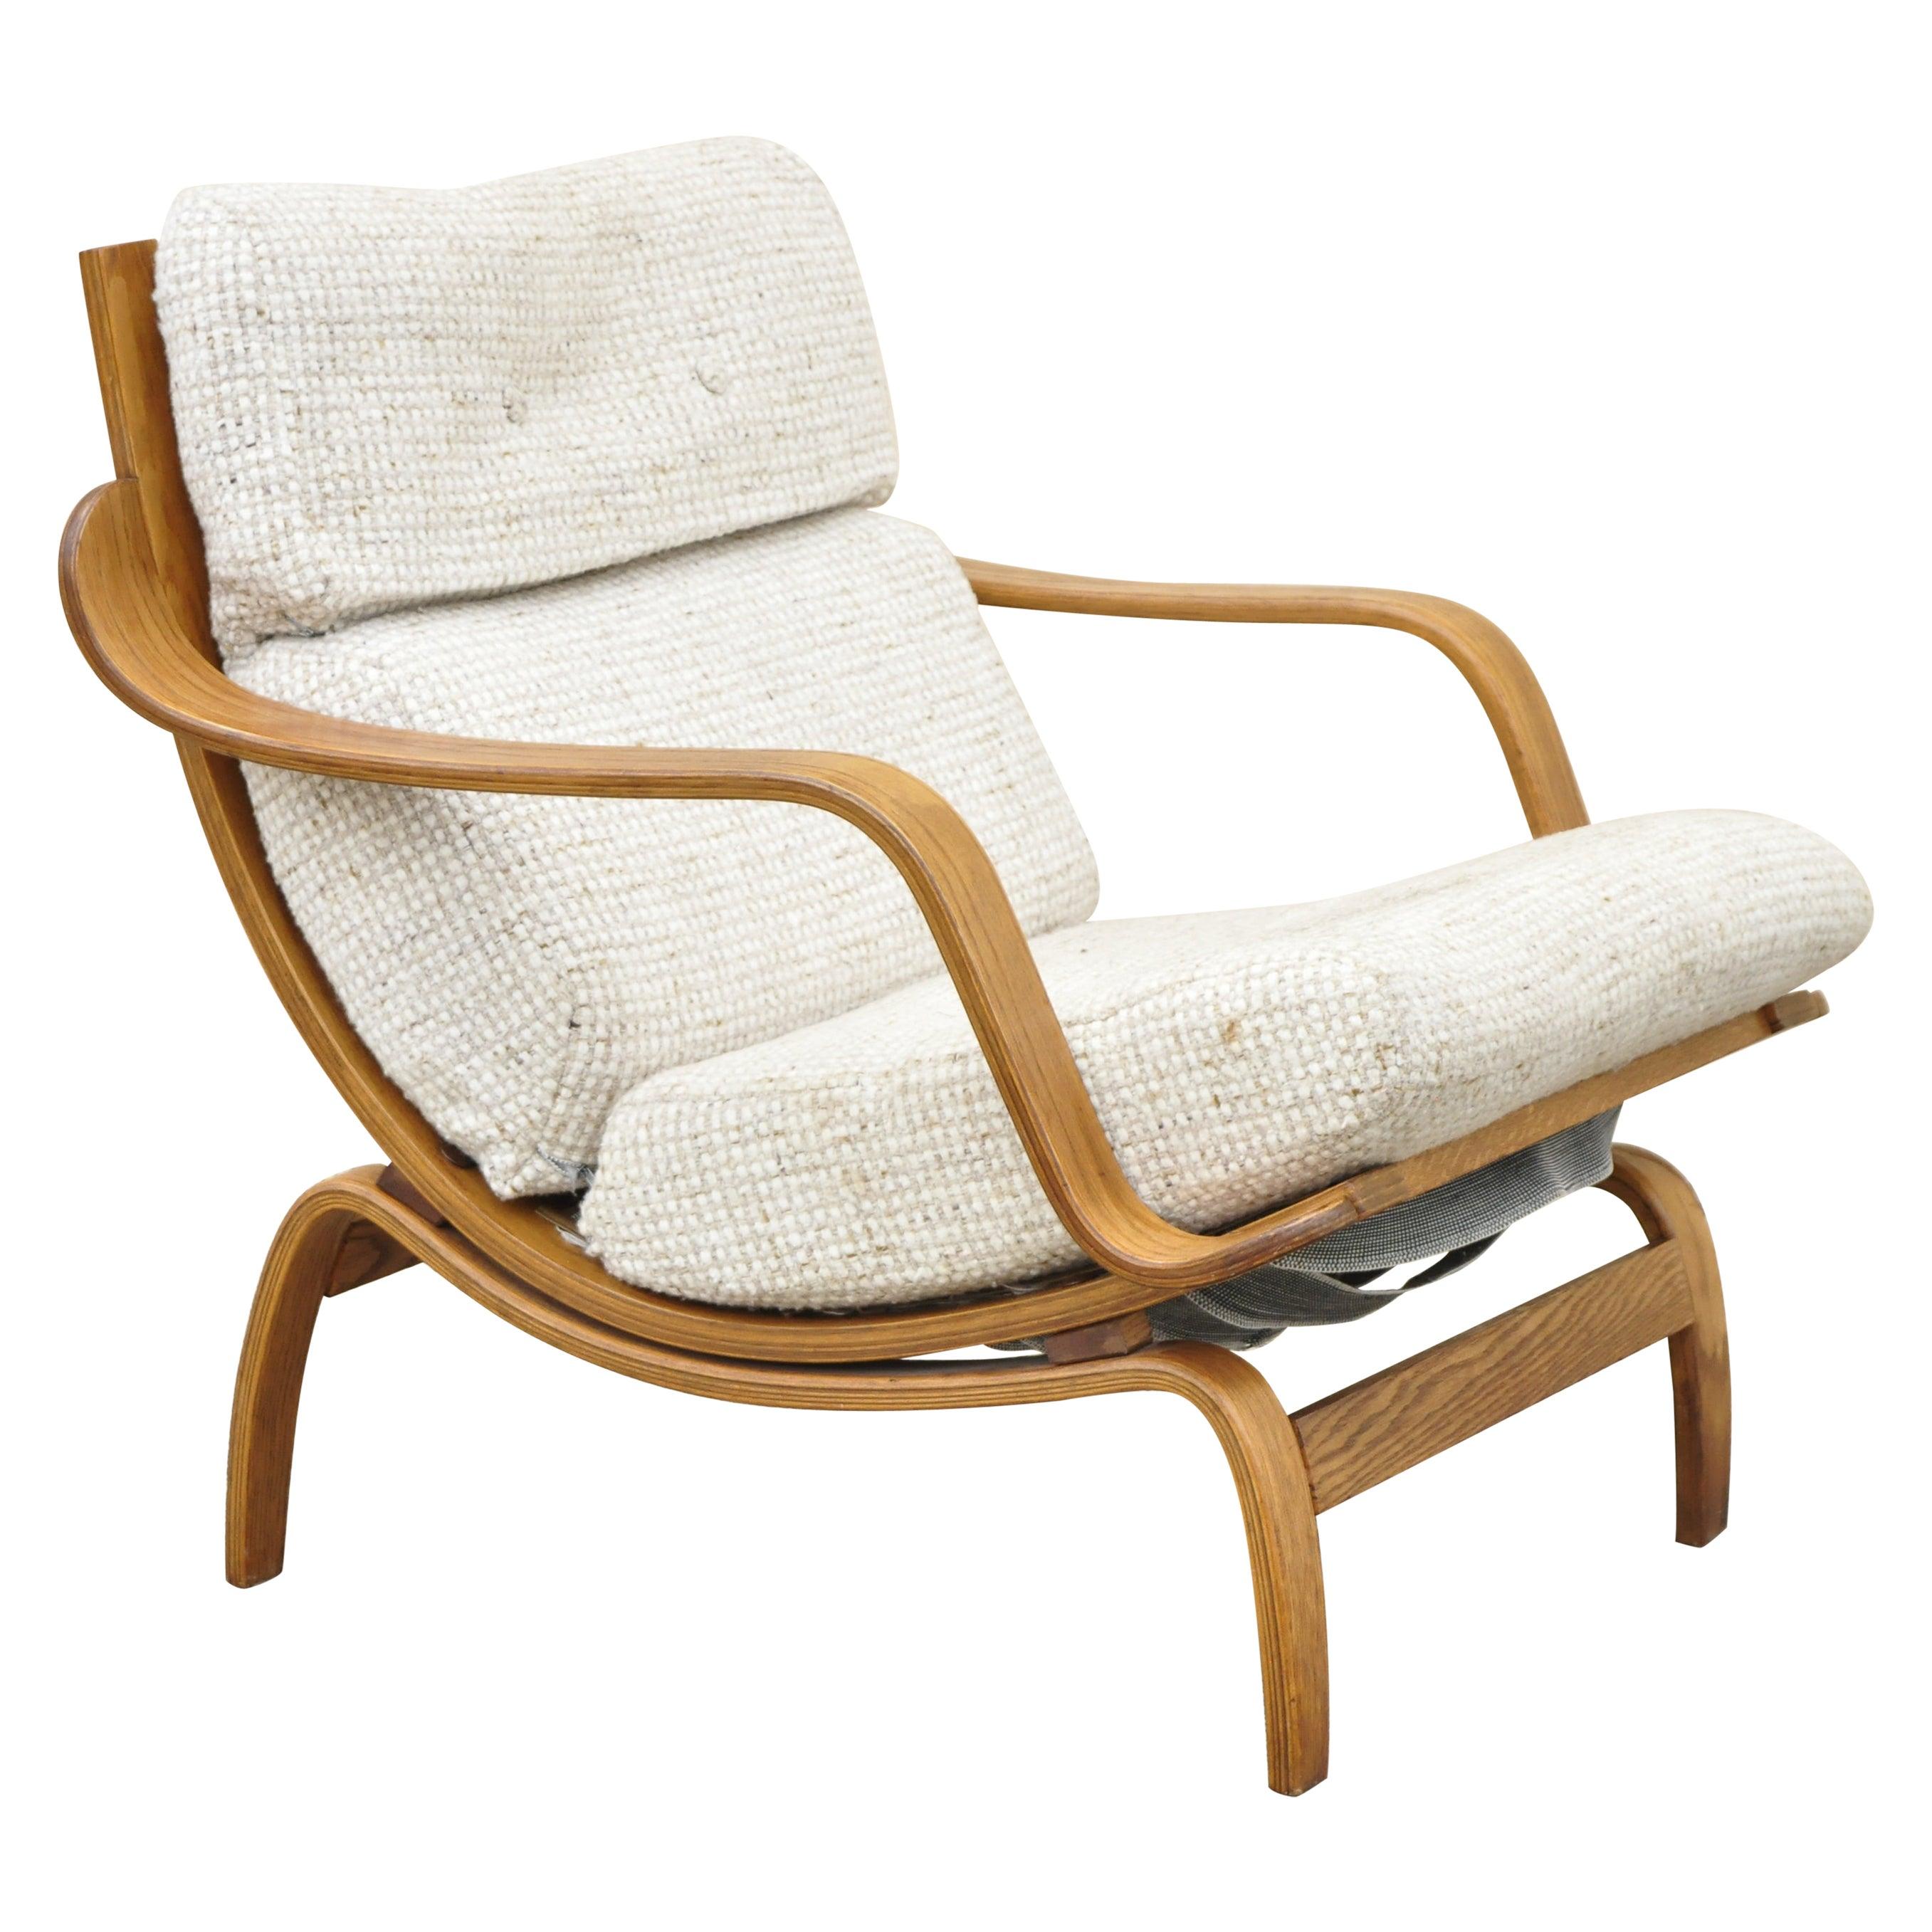 Charlton Century 21 Orbit Lounge Chair Mid Century Modern Vintage Bentwood Frame